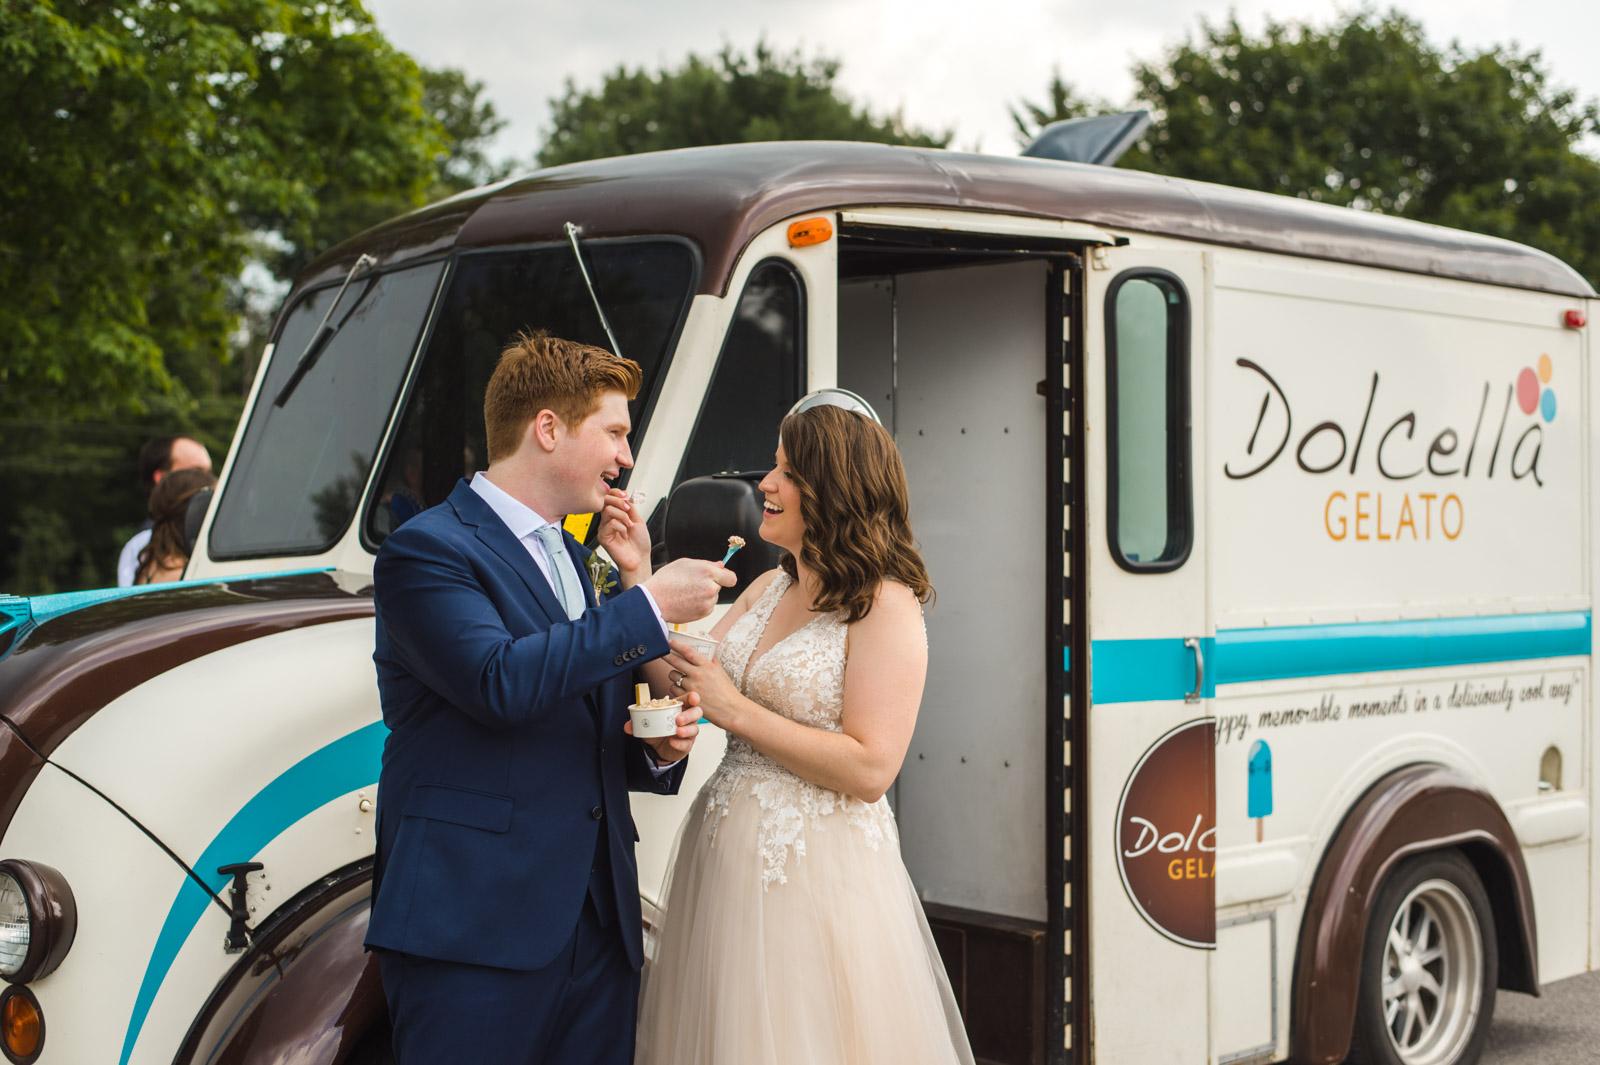 Emerson & Elicia's Golf Course Wedding Aidan & Leanne Hennebry Hamilton Wedding Videographers Photographers Niagara Hush Hush Photography & Film-36.jpg